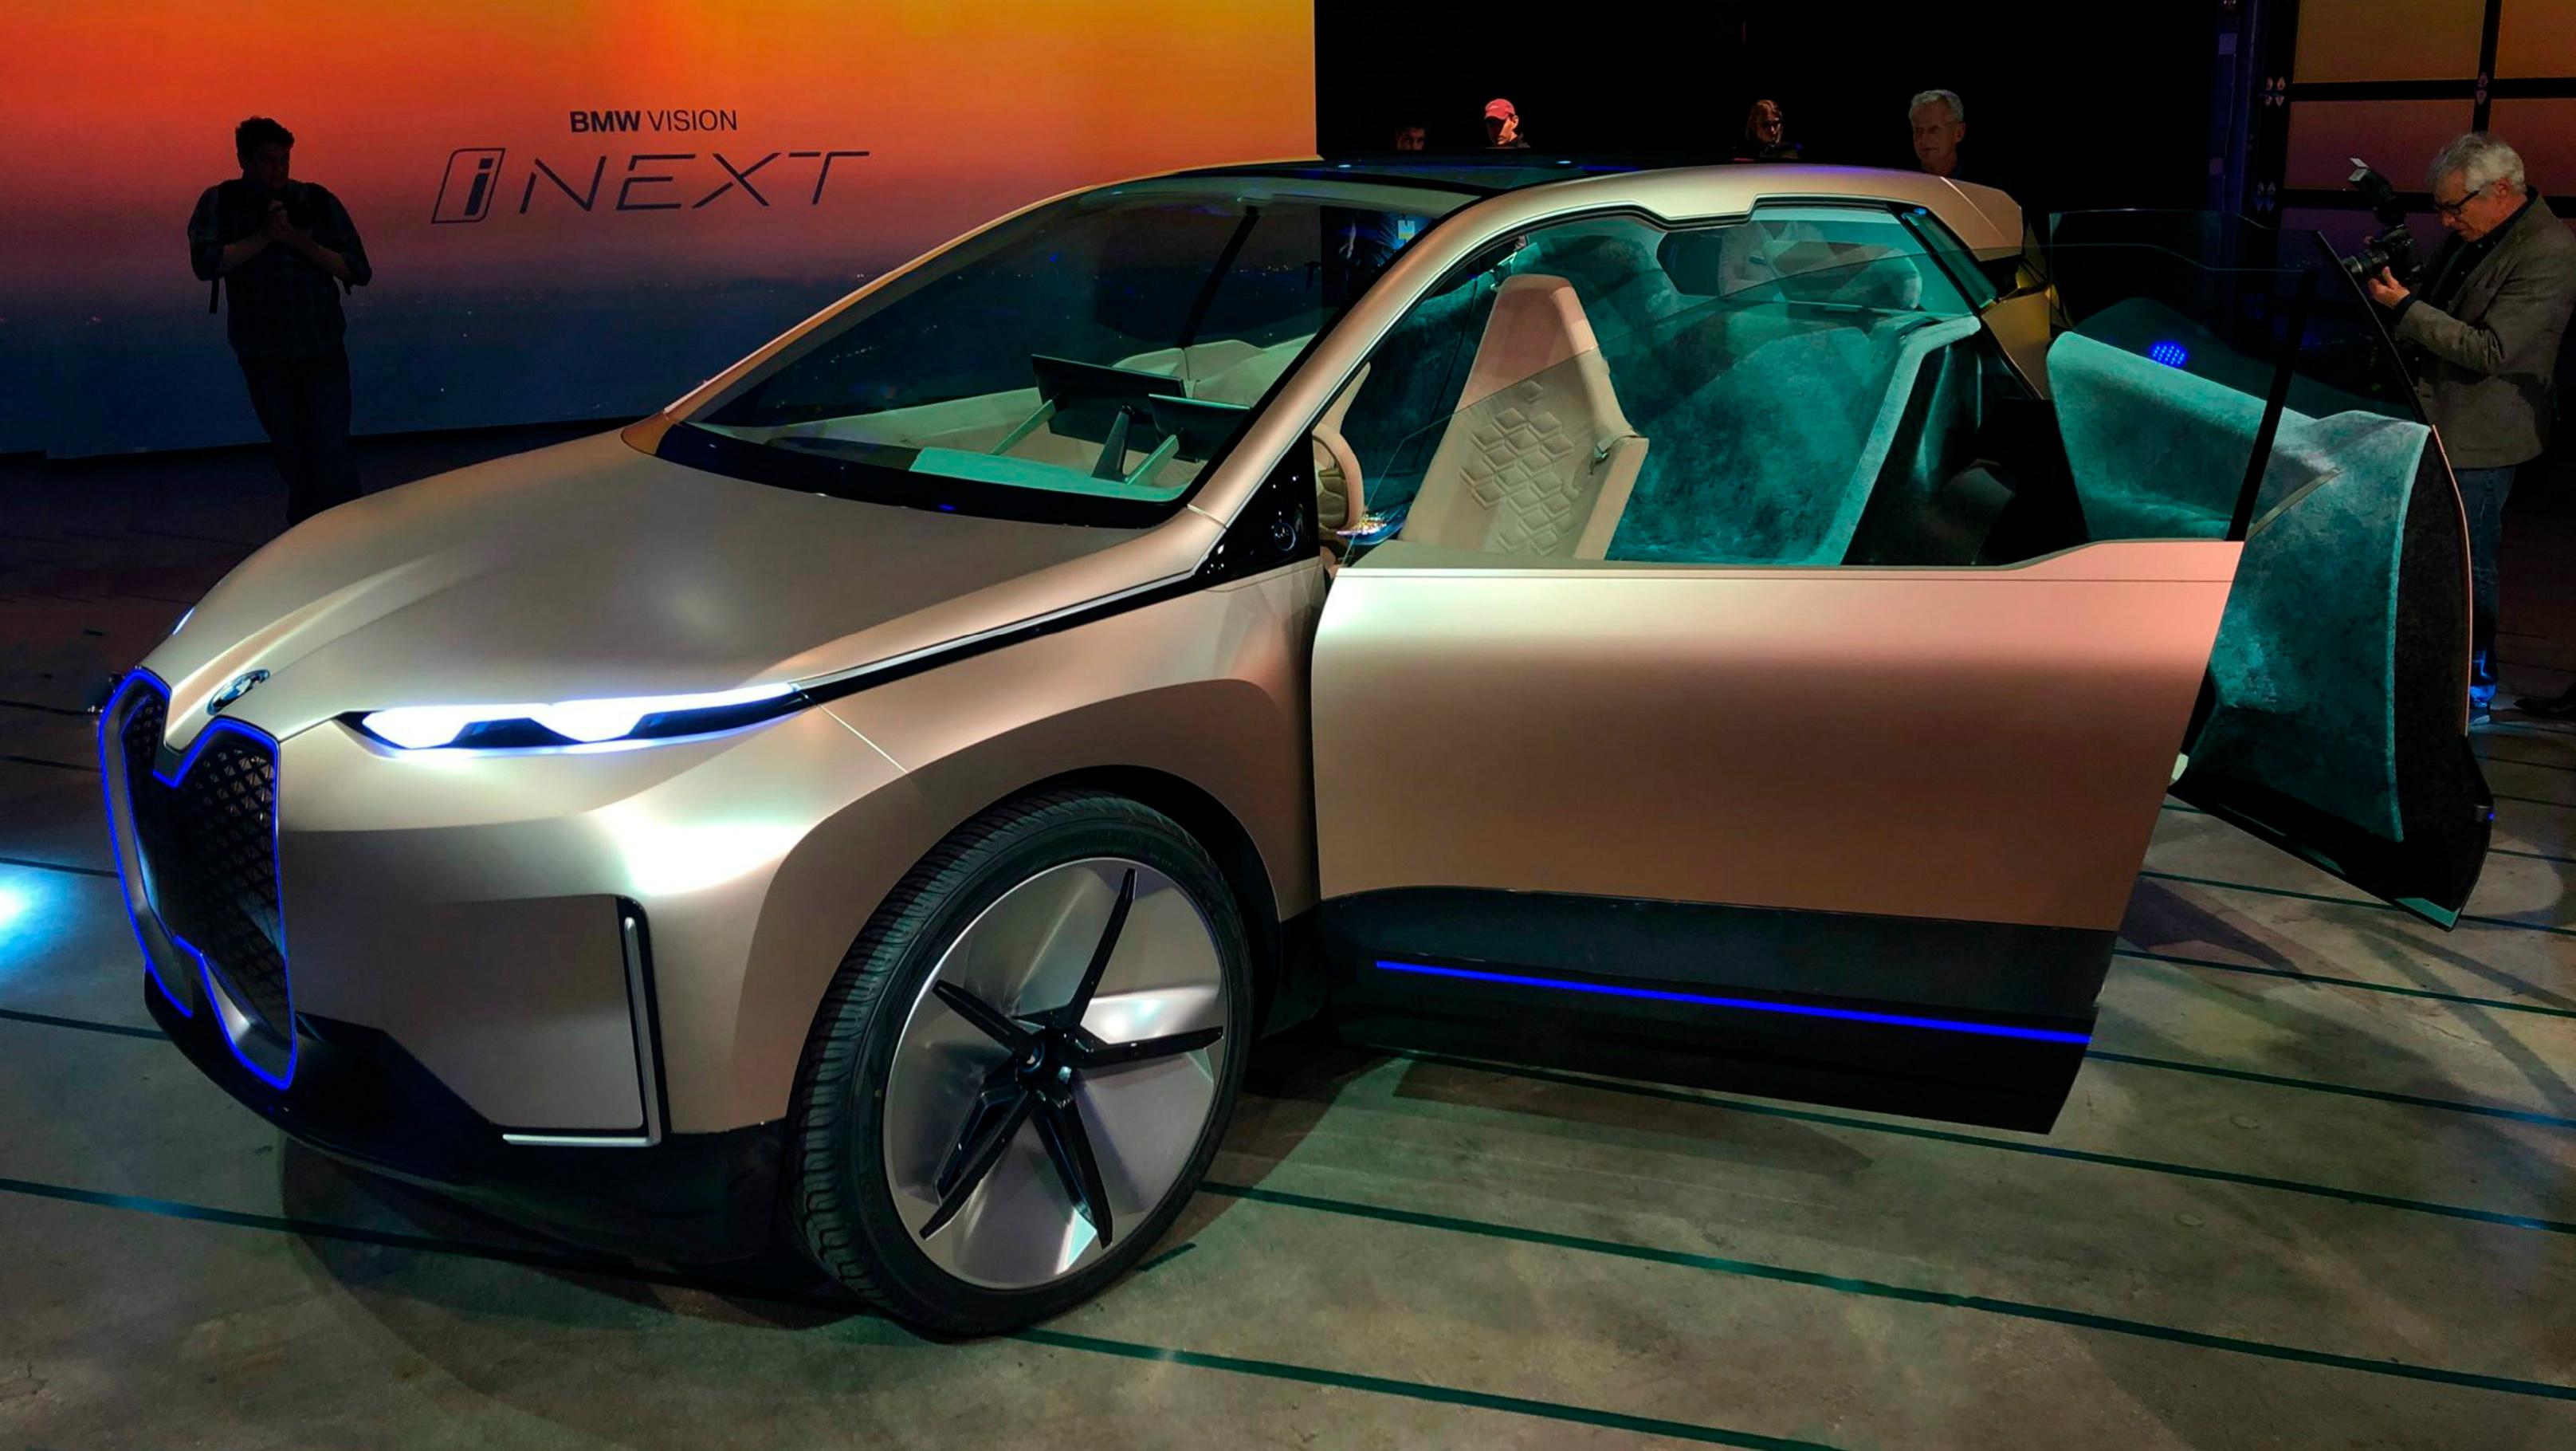 bmw vision inext premieres at automobility la – wheels.ca